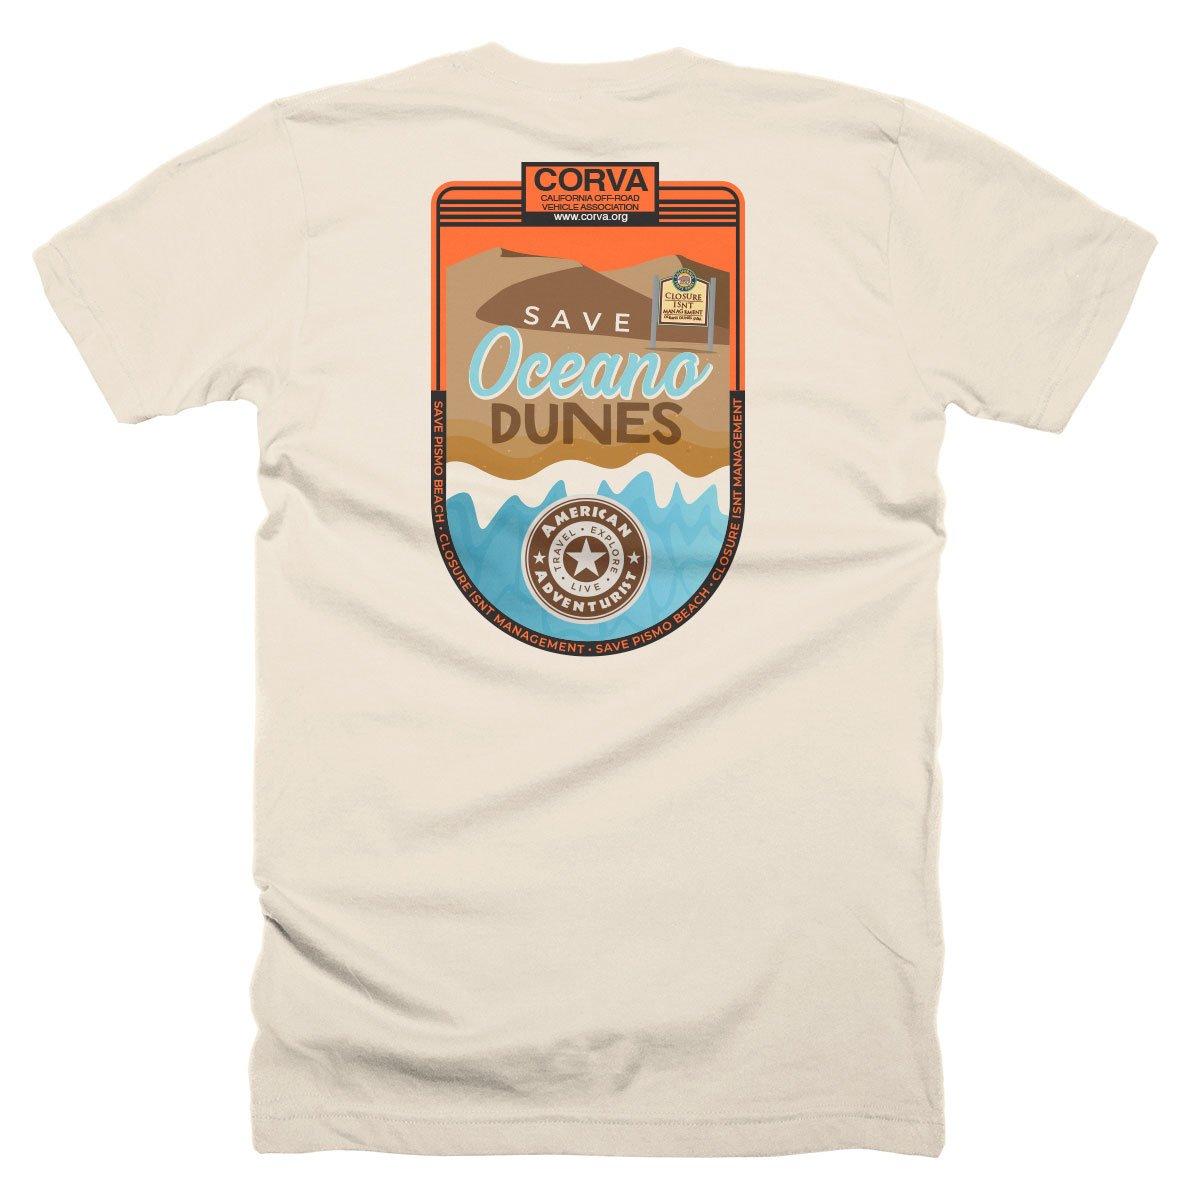 Image of SAVE Oceano Dunes Shirt